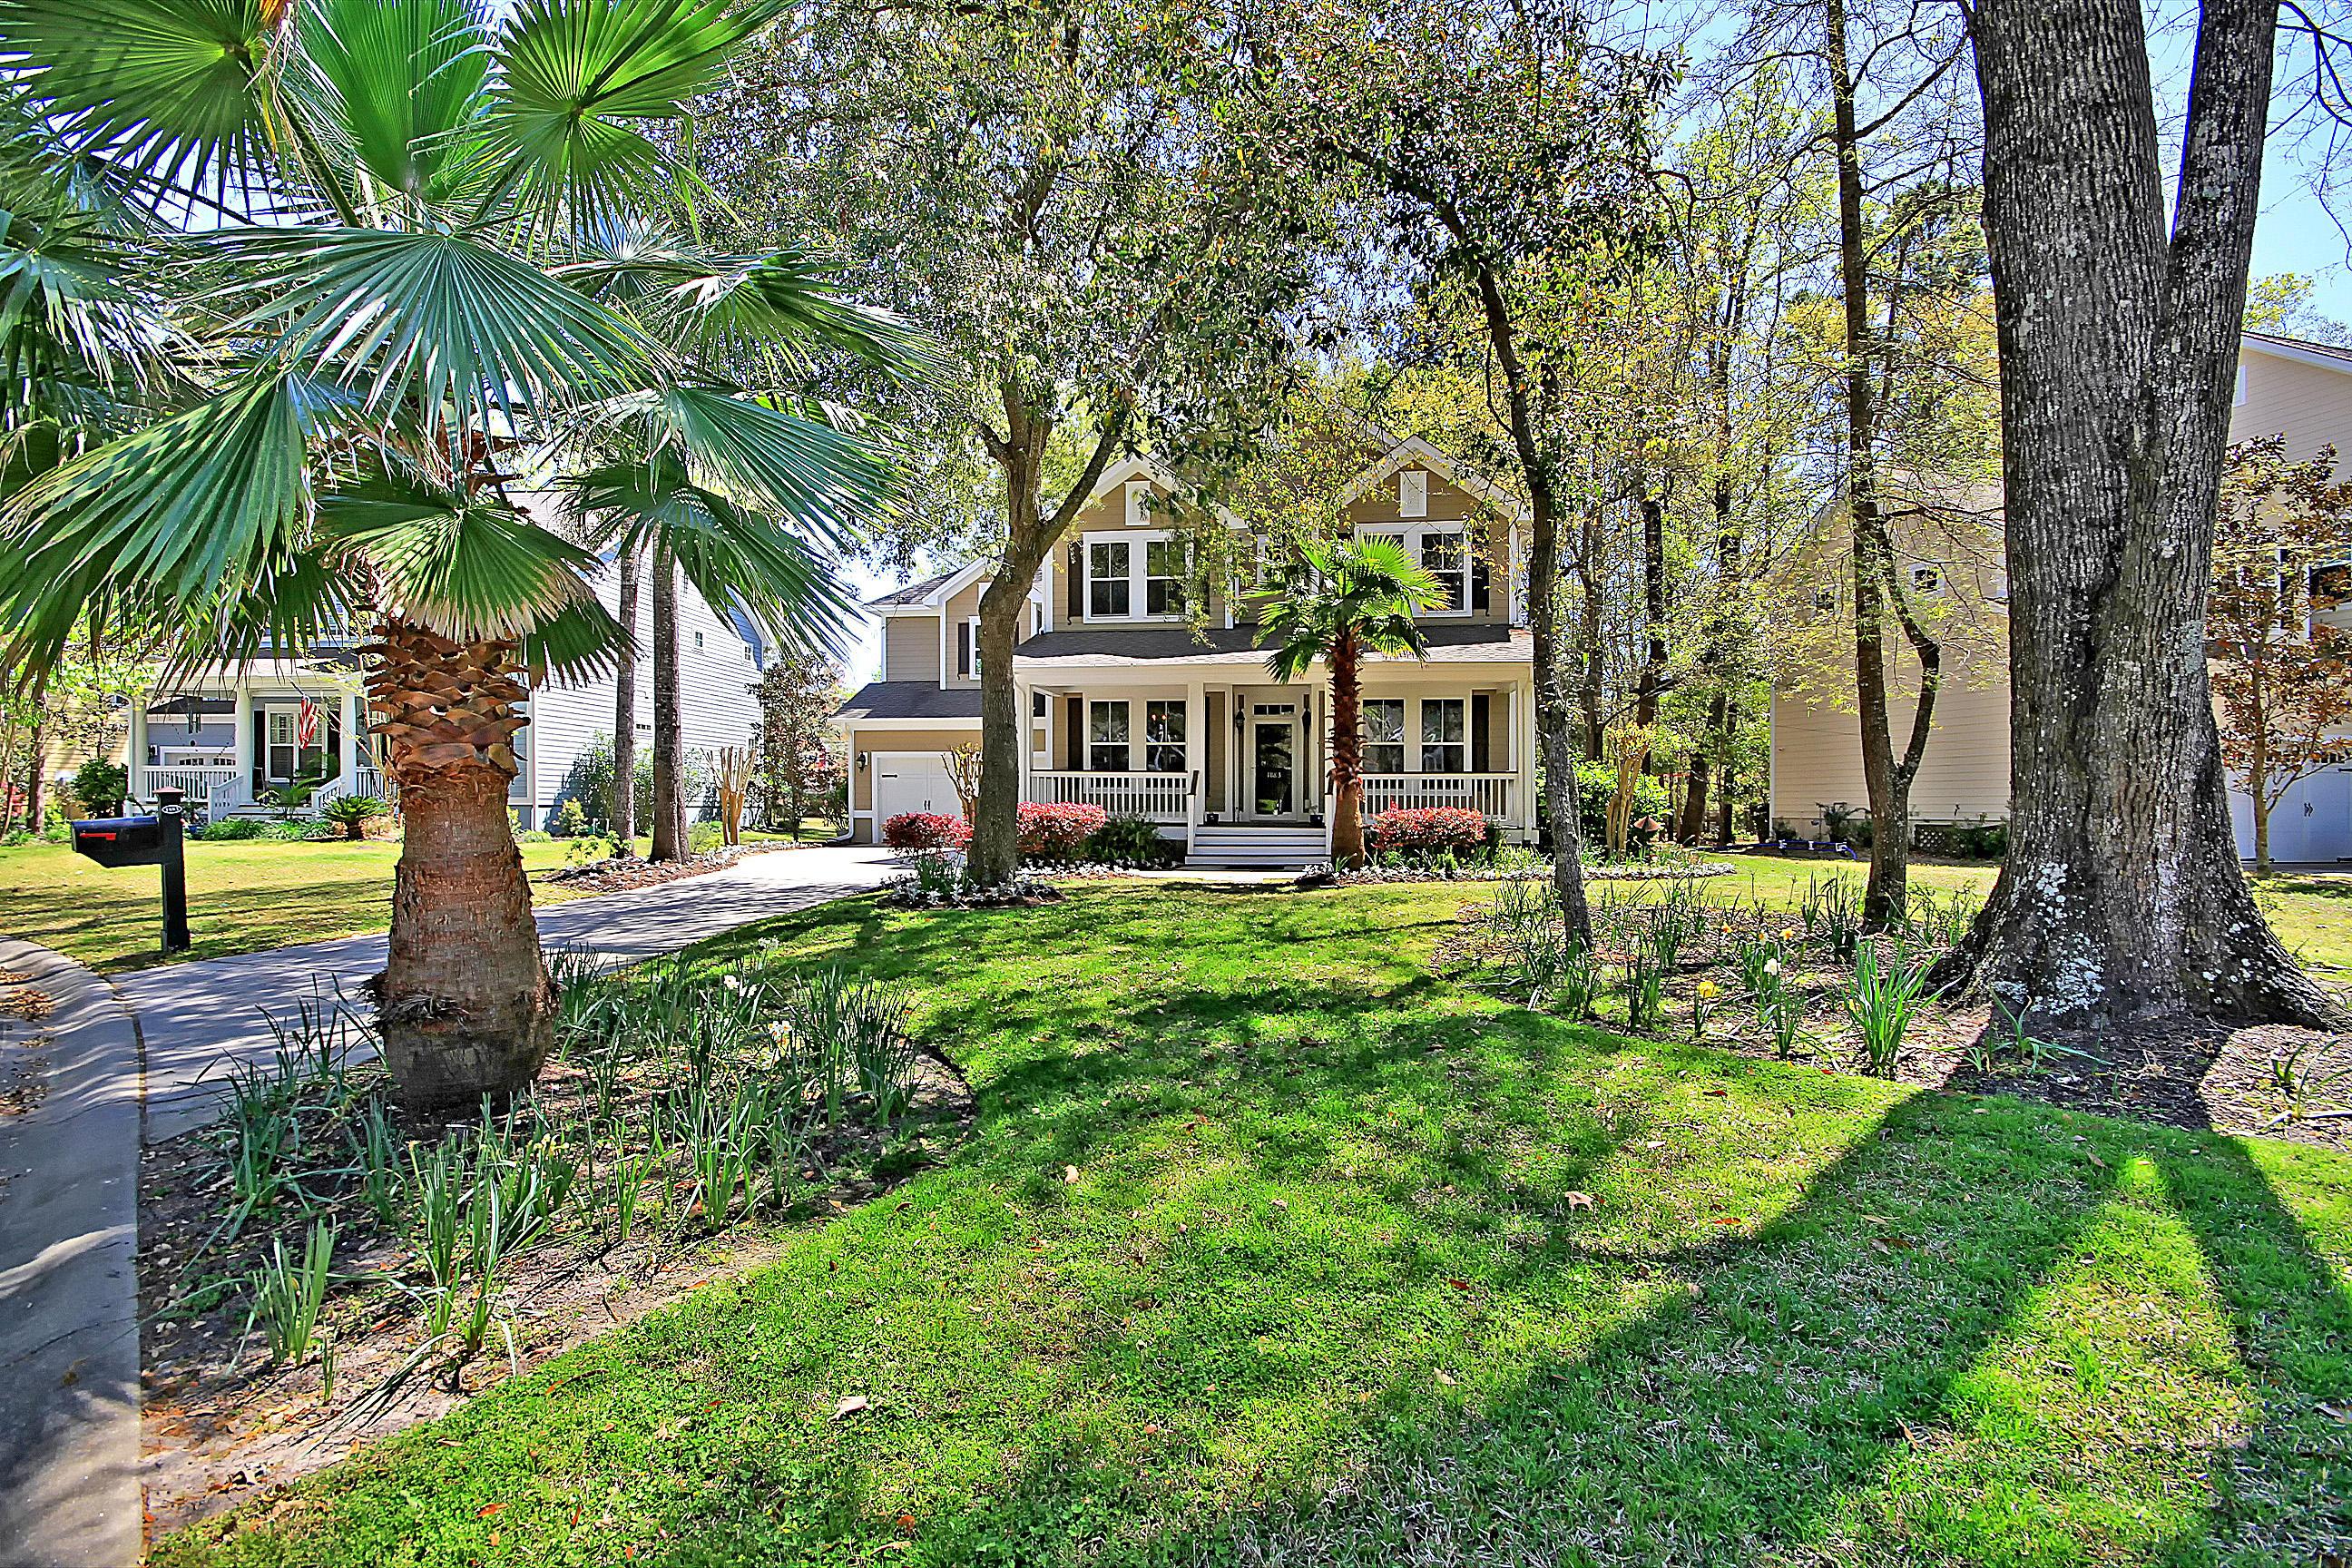 Park West Homes For Sale - 1883 Hall Point, Mount Pleasant, SC - 21